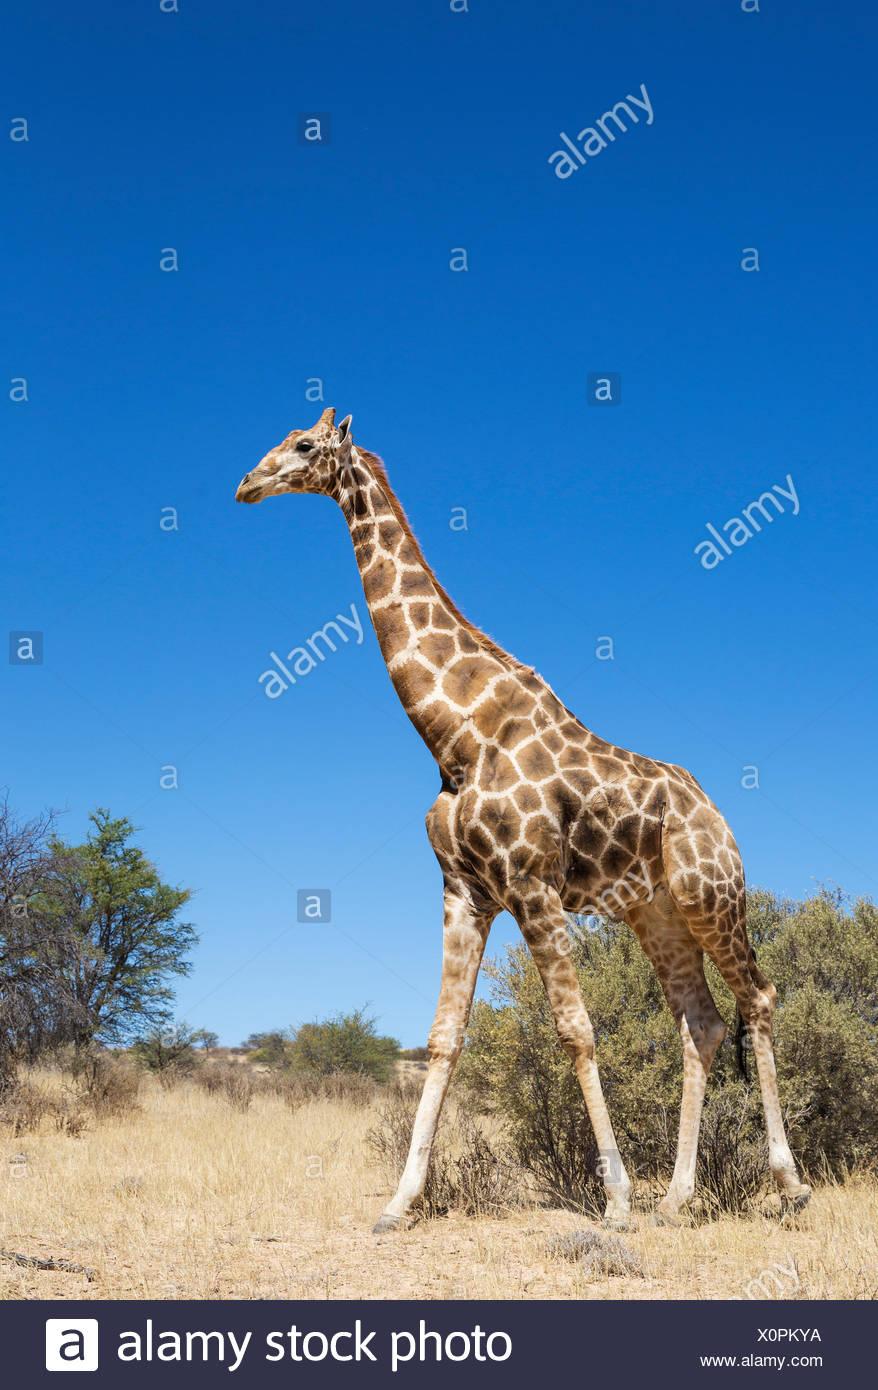 Giraffa meridionale (giraffa giraffa), di età compresa tra i maschi, deserto Kalahari, kgalagadi parco transfrontaliero, sud africa Immagini Stock